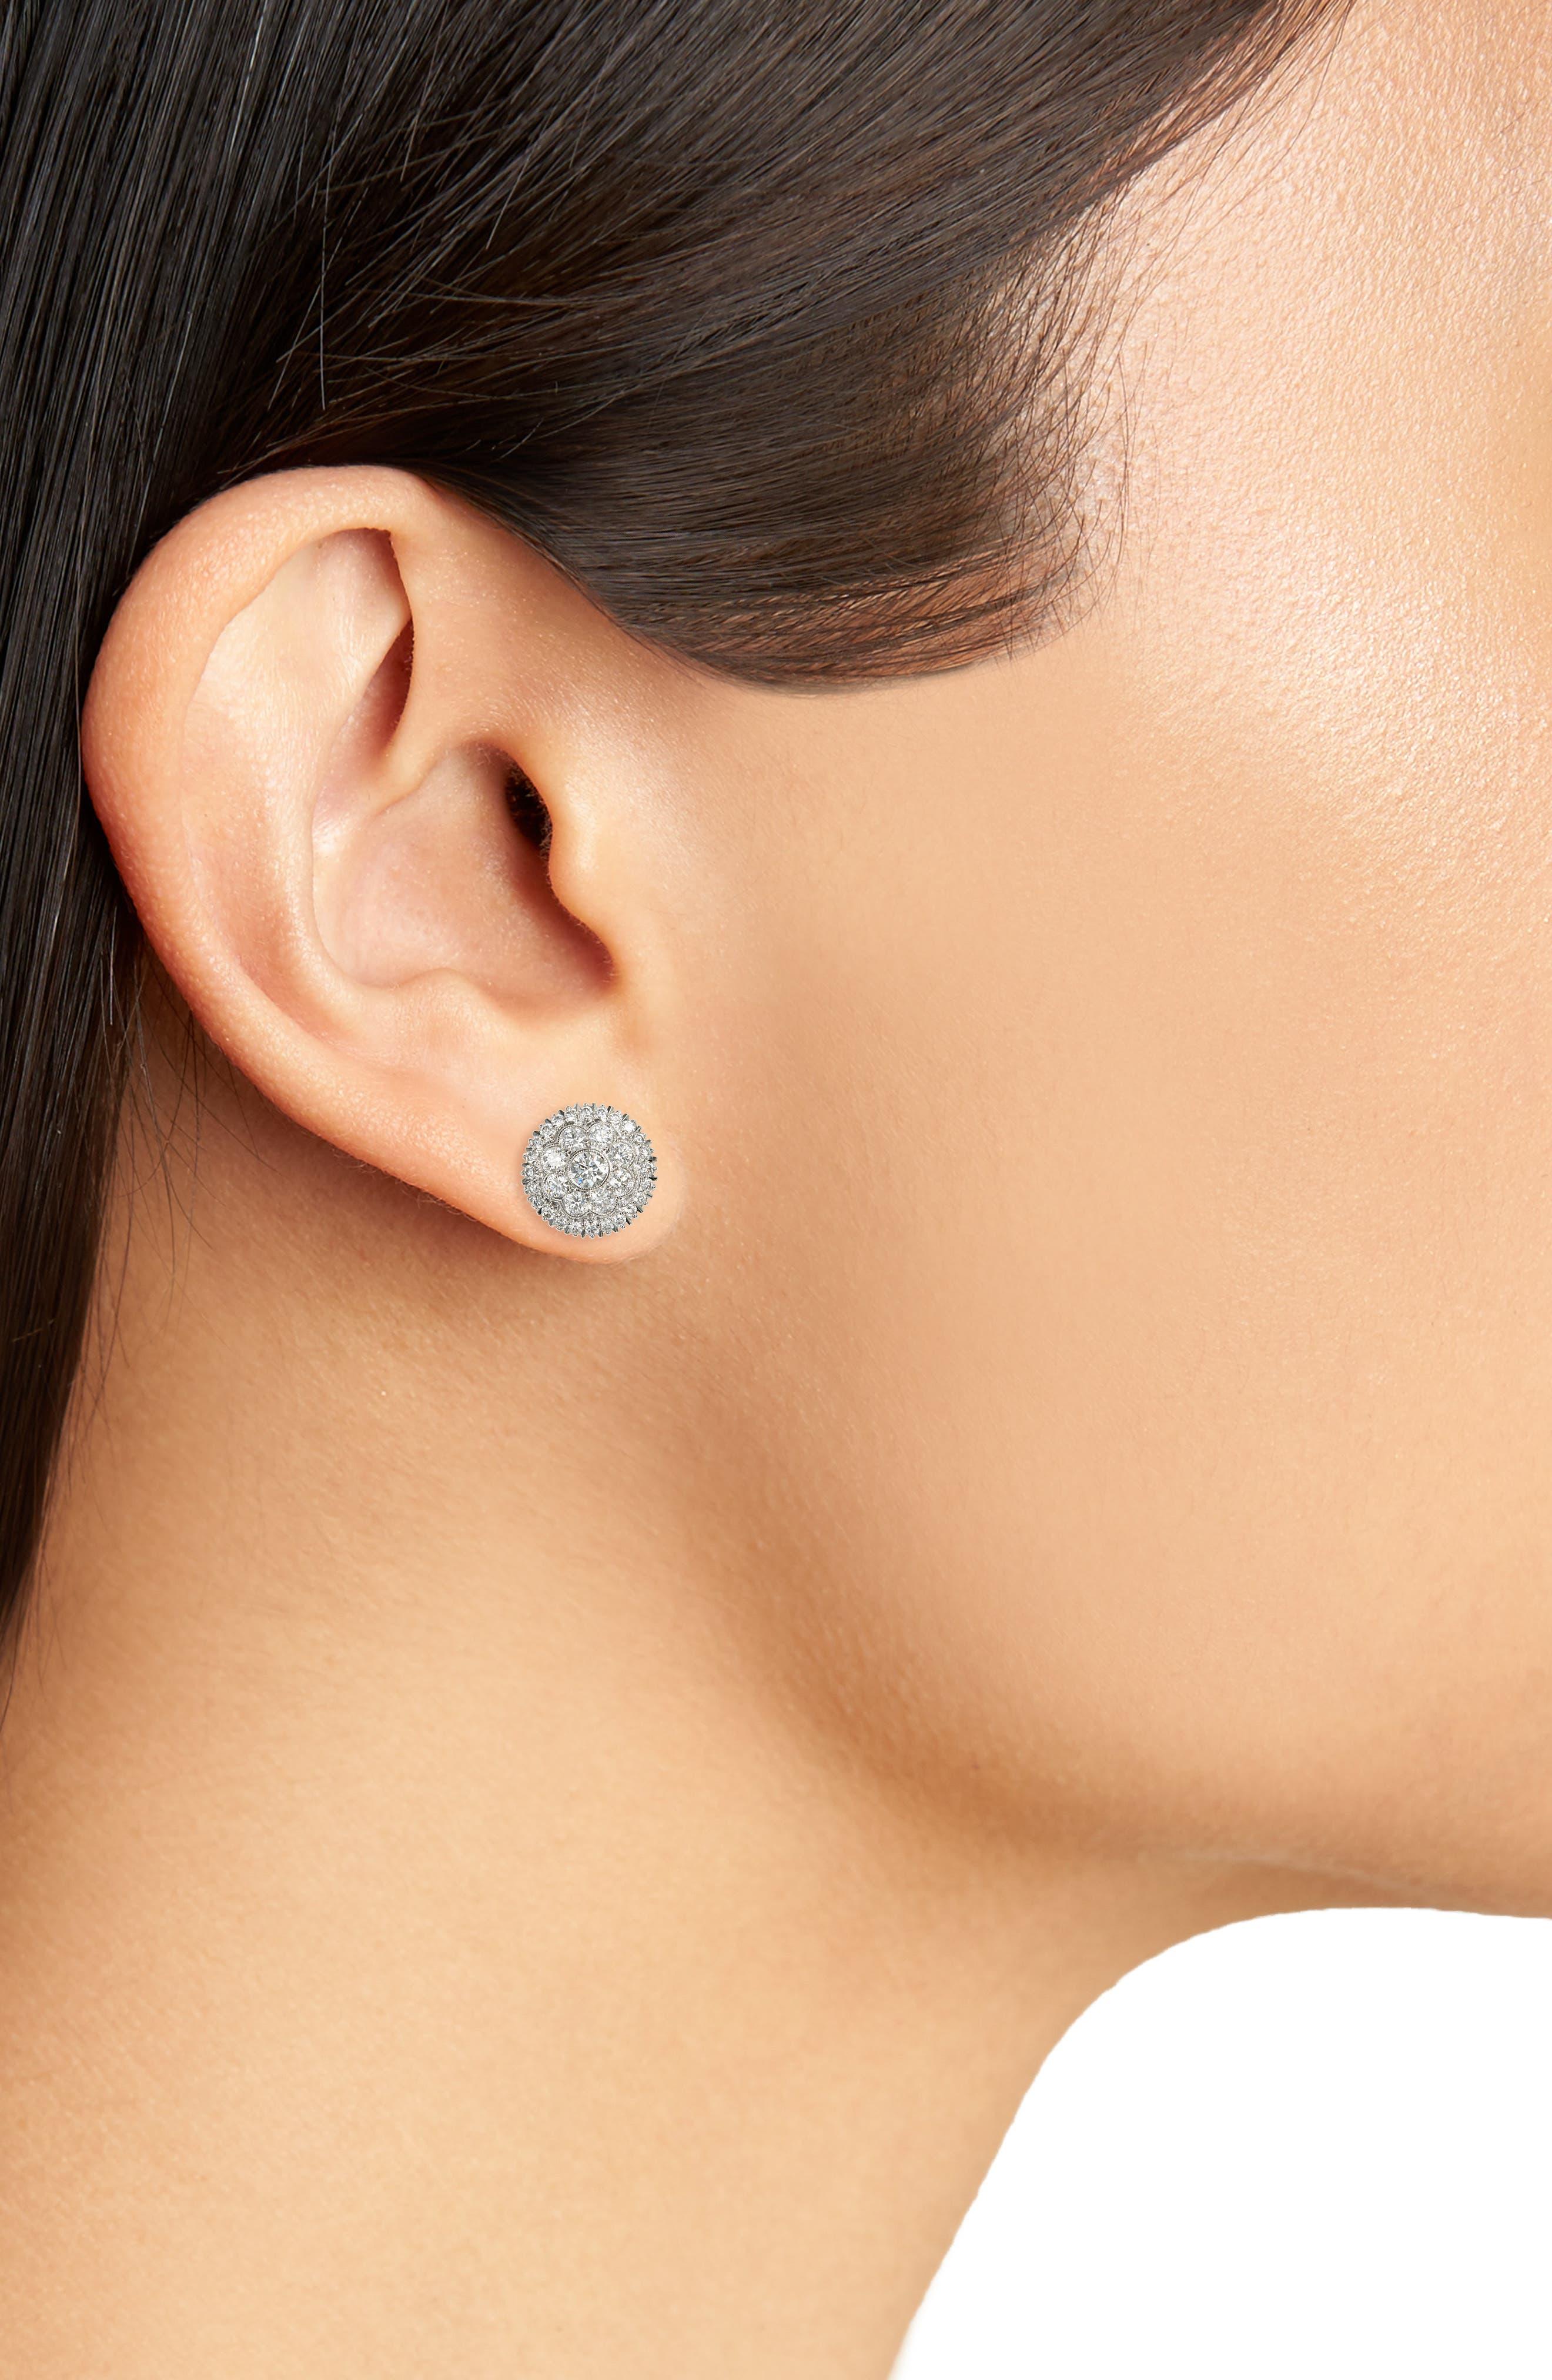 Diamond Stud Earrings,                             Alternate thumbnail 2, color,                             711